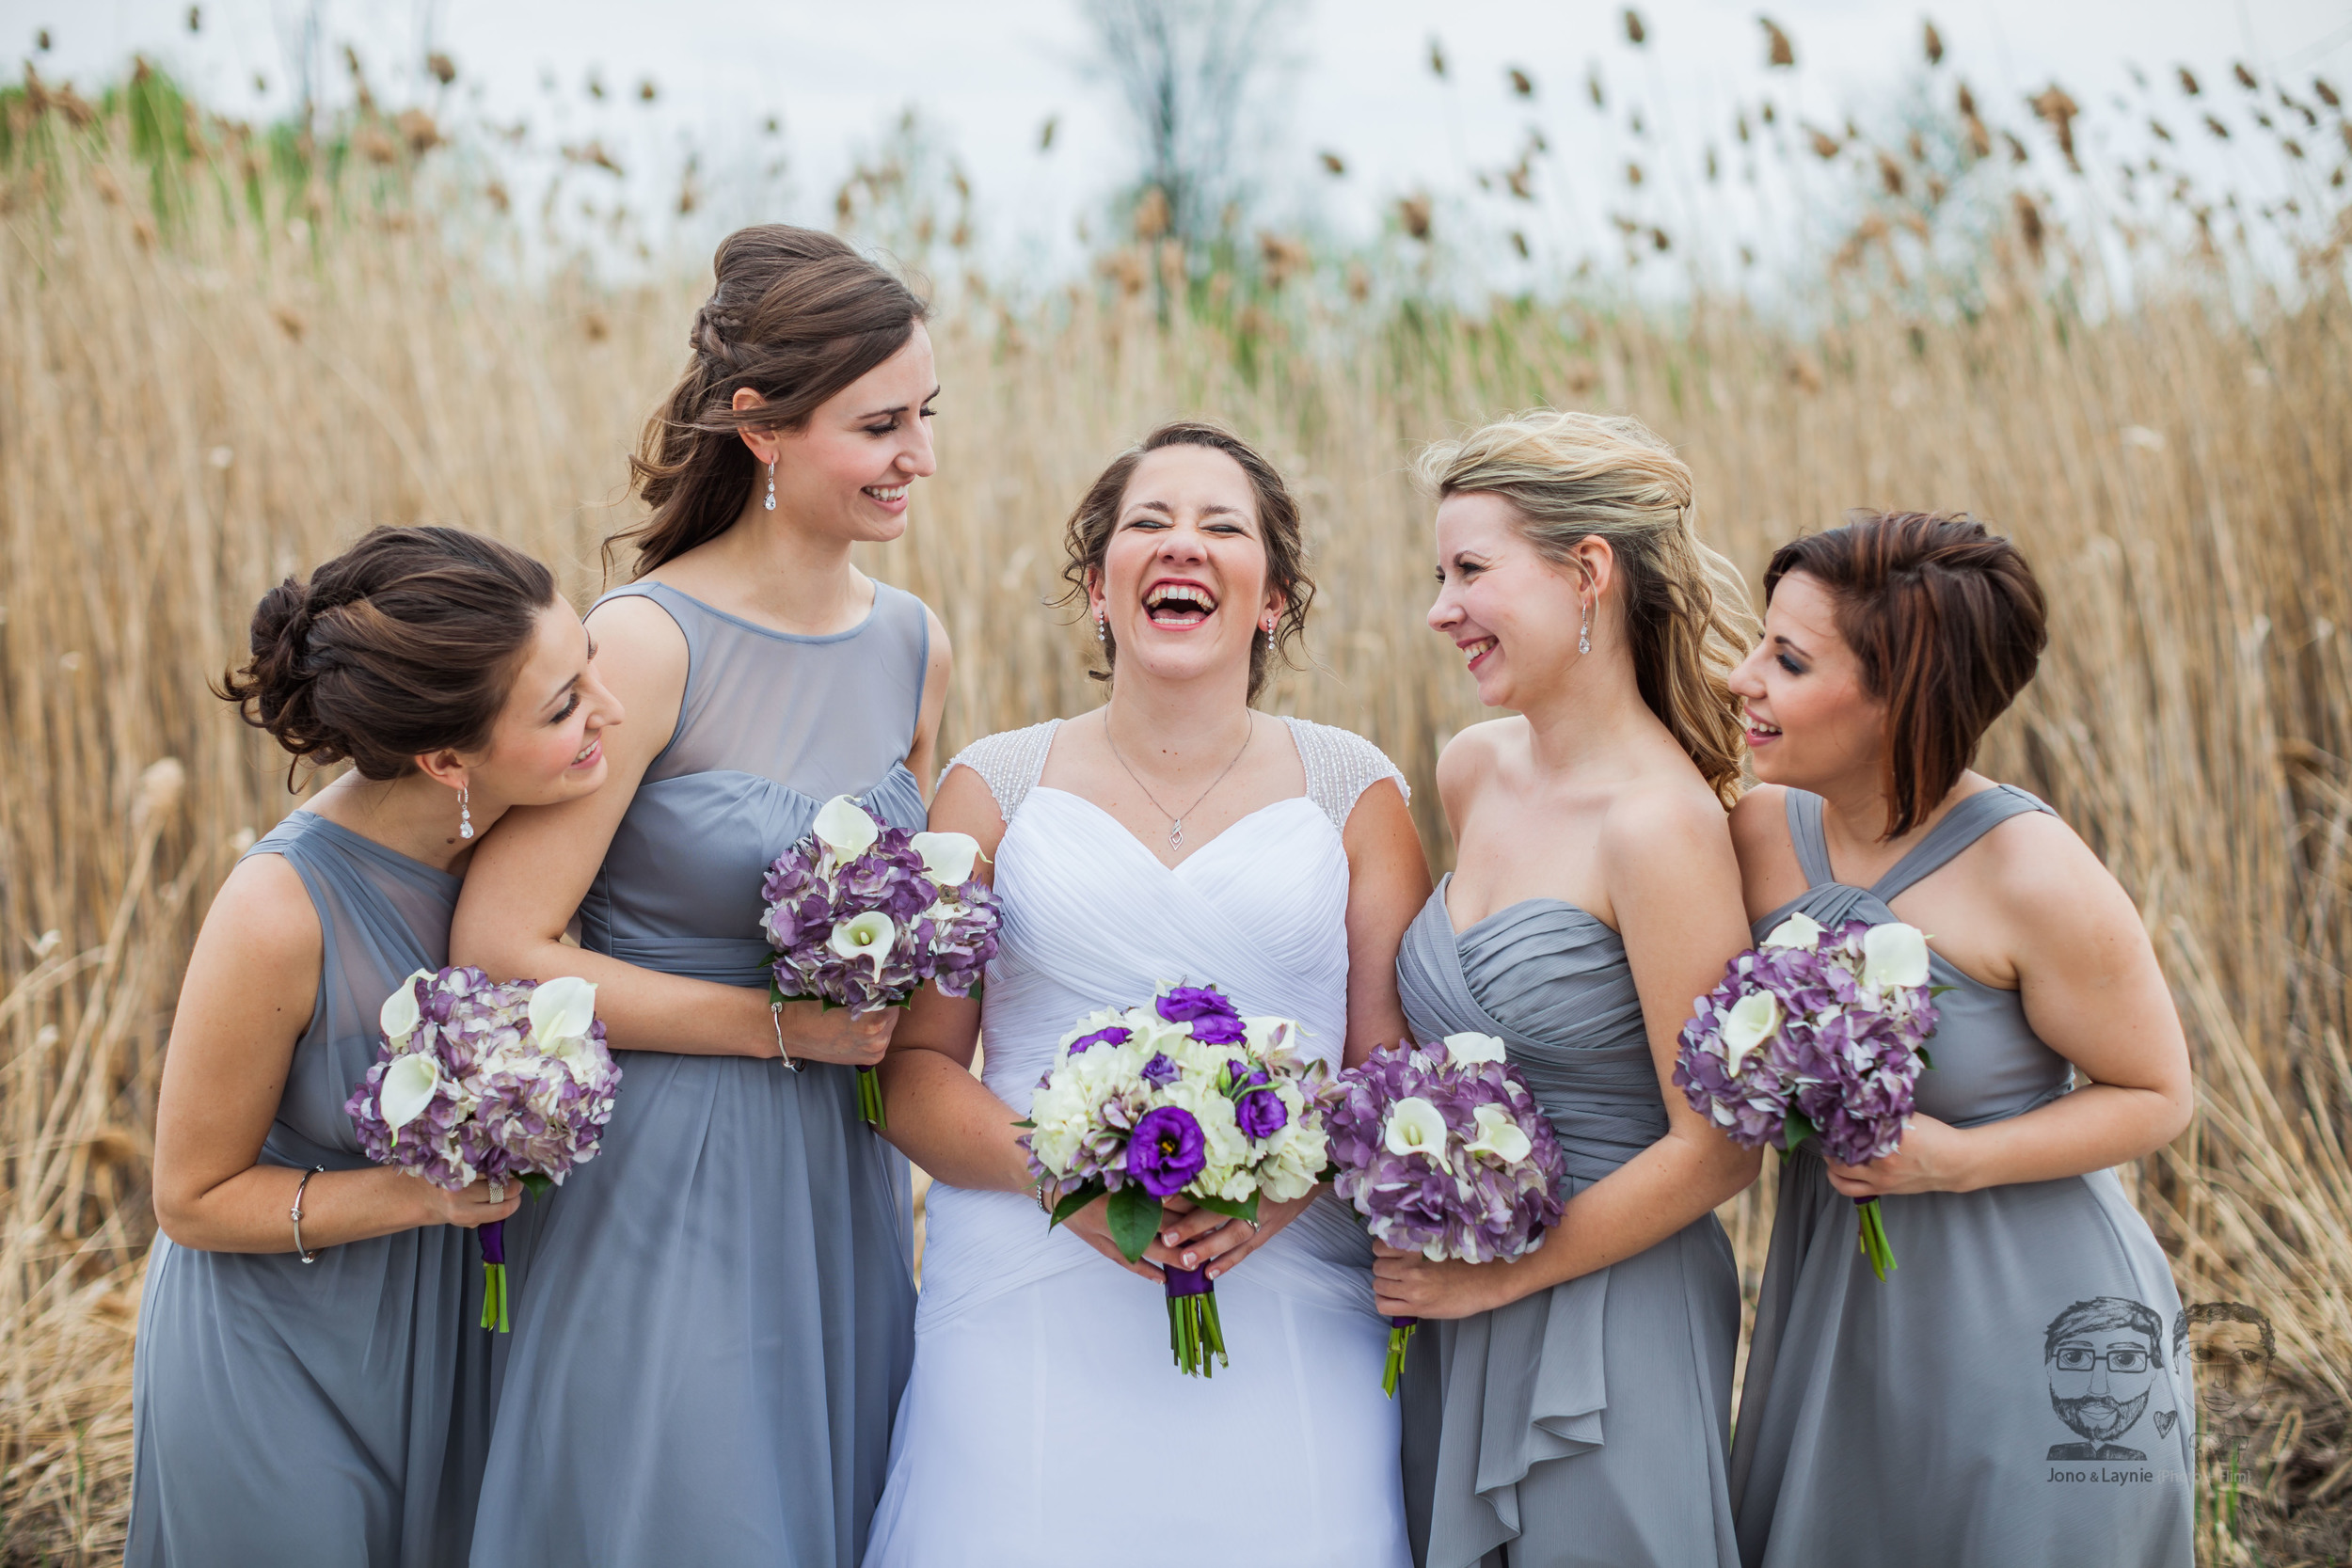 19Toronto Wedding Photographers and Videographers-Jono & Laynie Co.-Orangeville Wedding.jpg